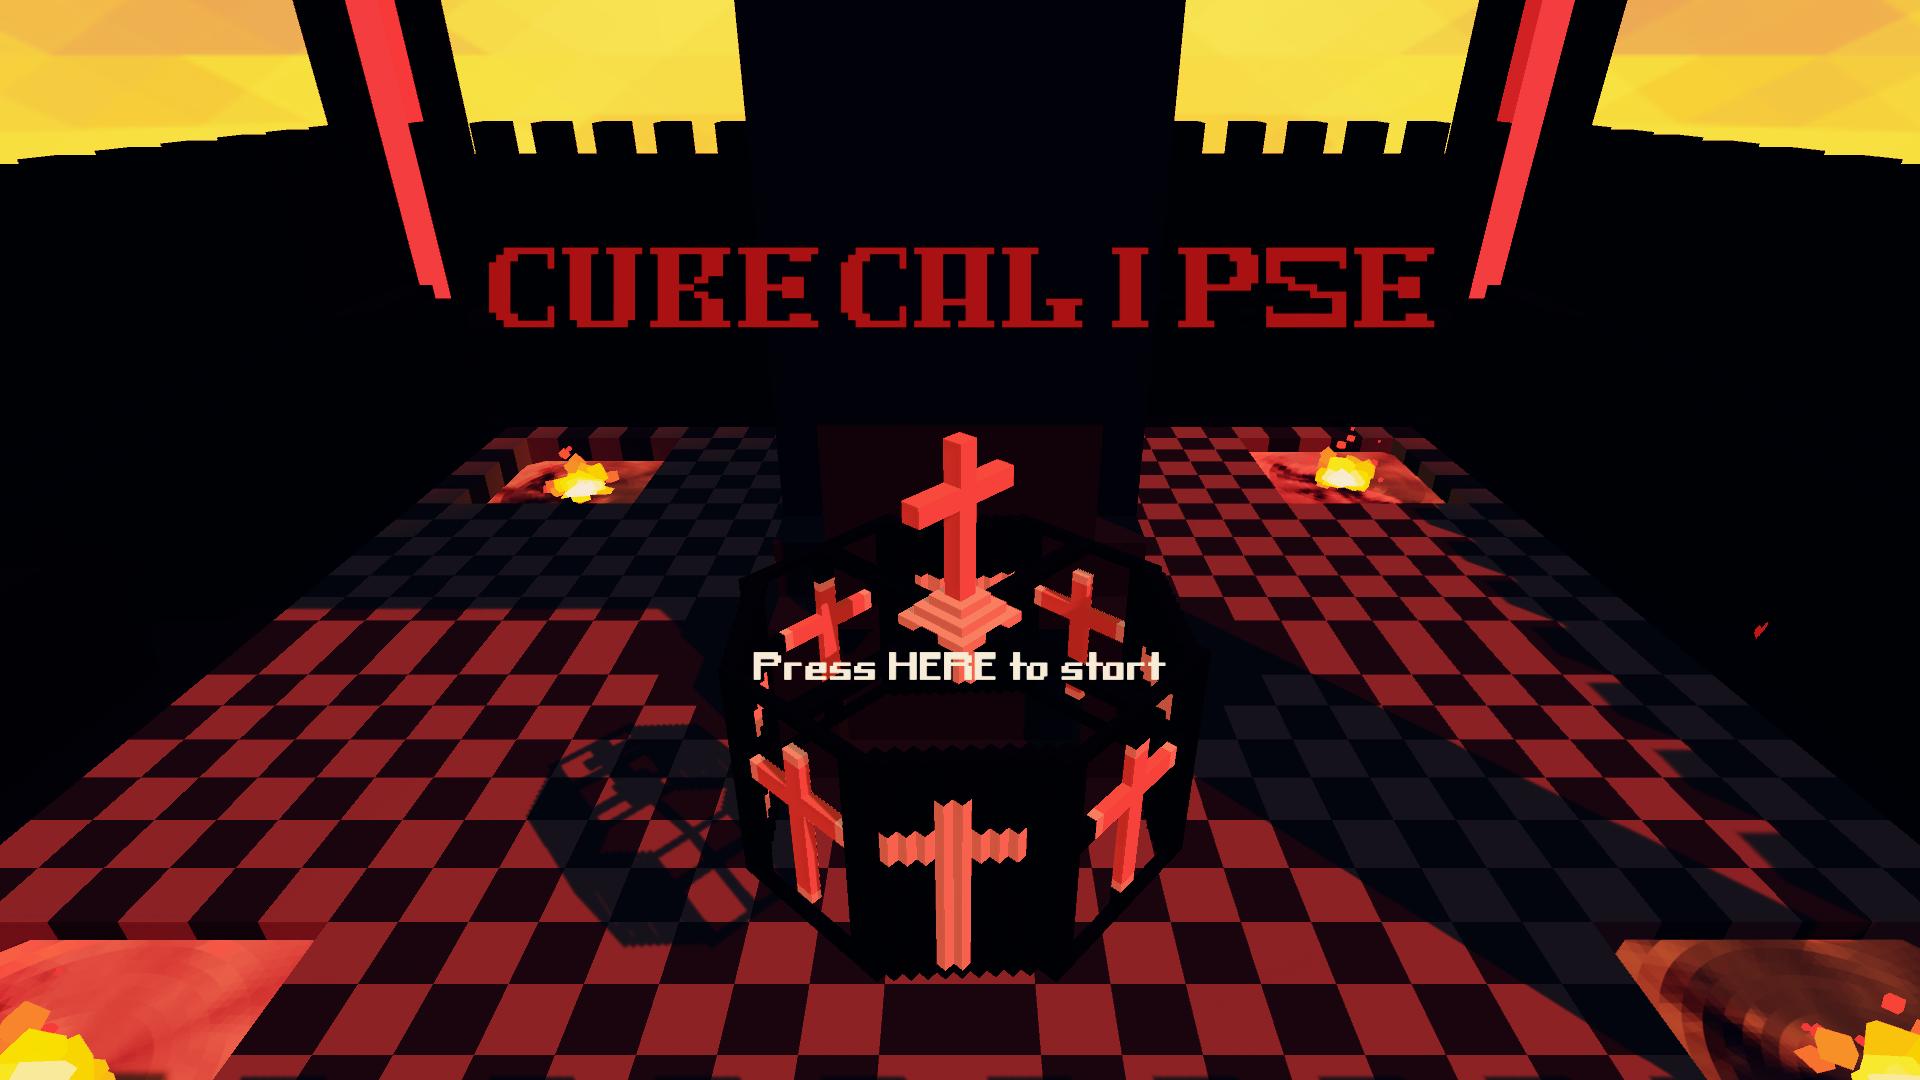 Cubecalipse